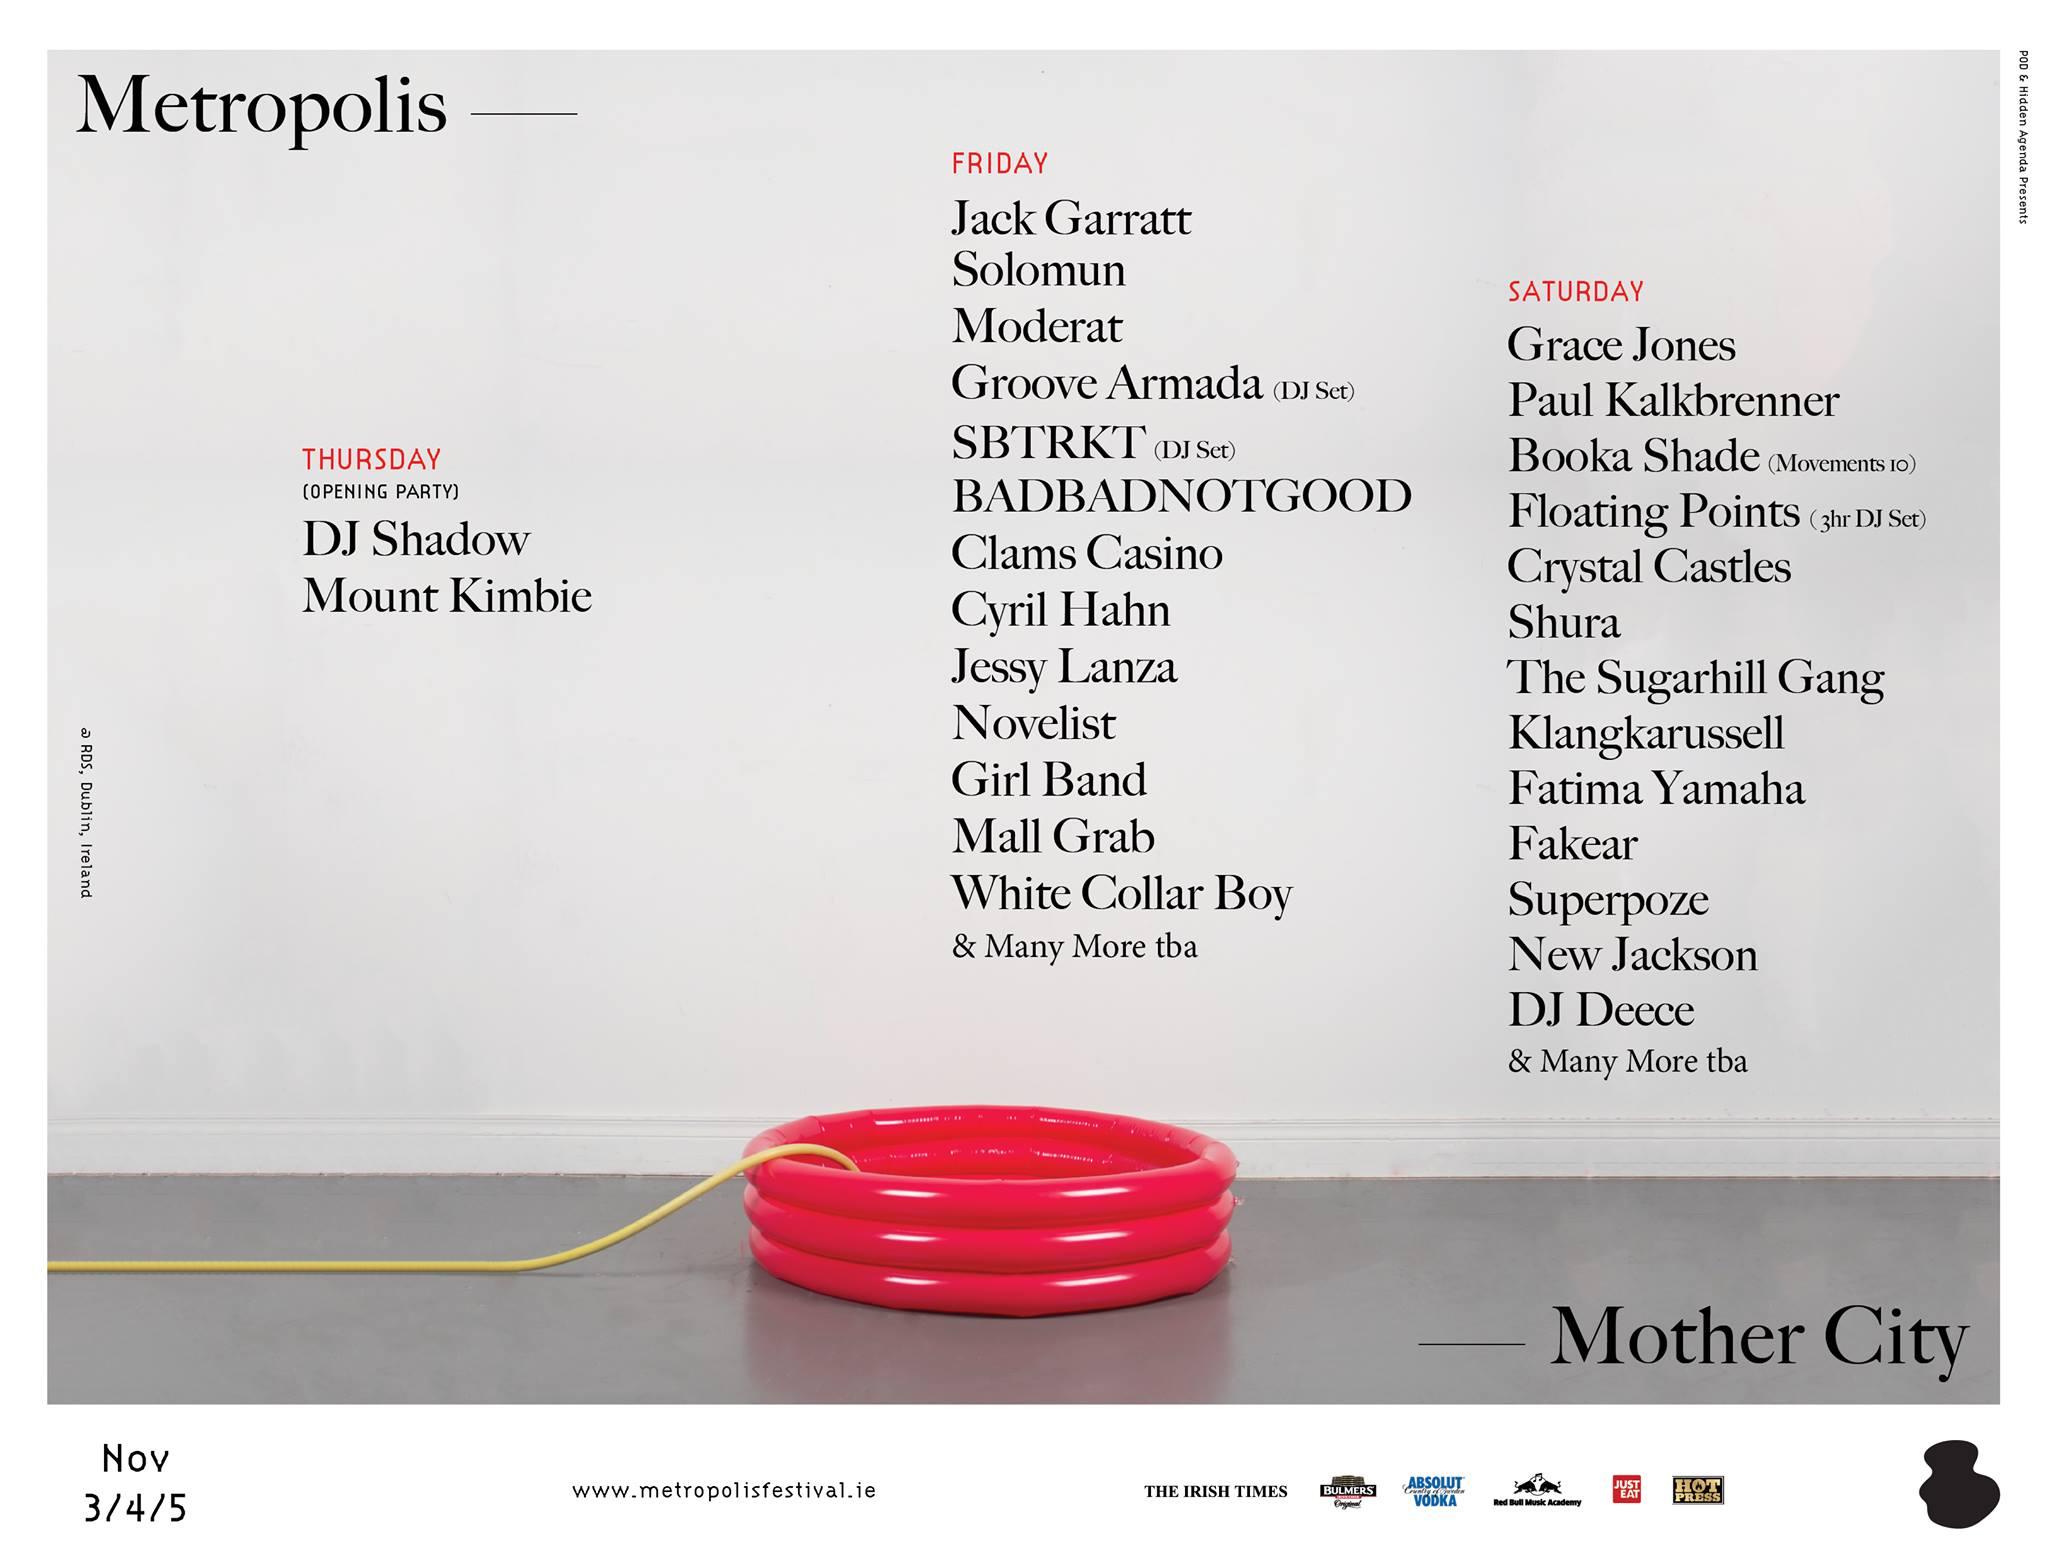 Playlist | TLMT's Metropolis 2016 Mixed-Tape – The Last